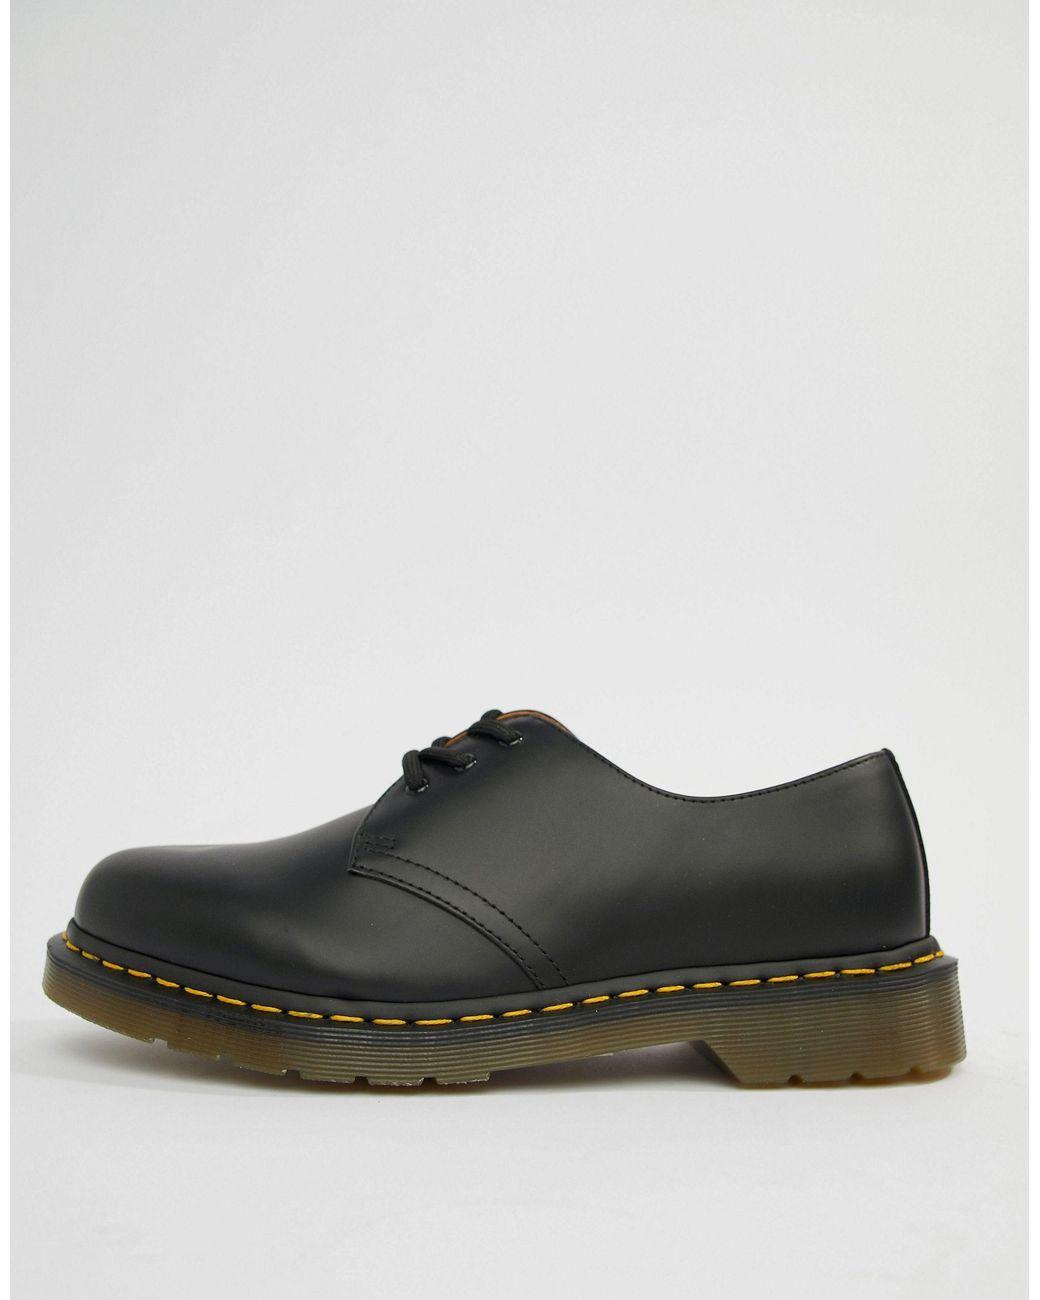 dr martens 3 eye shoe